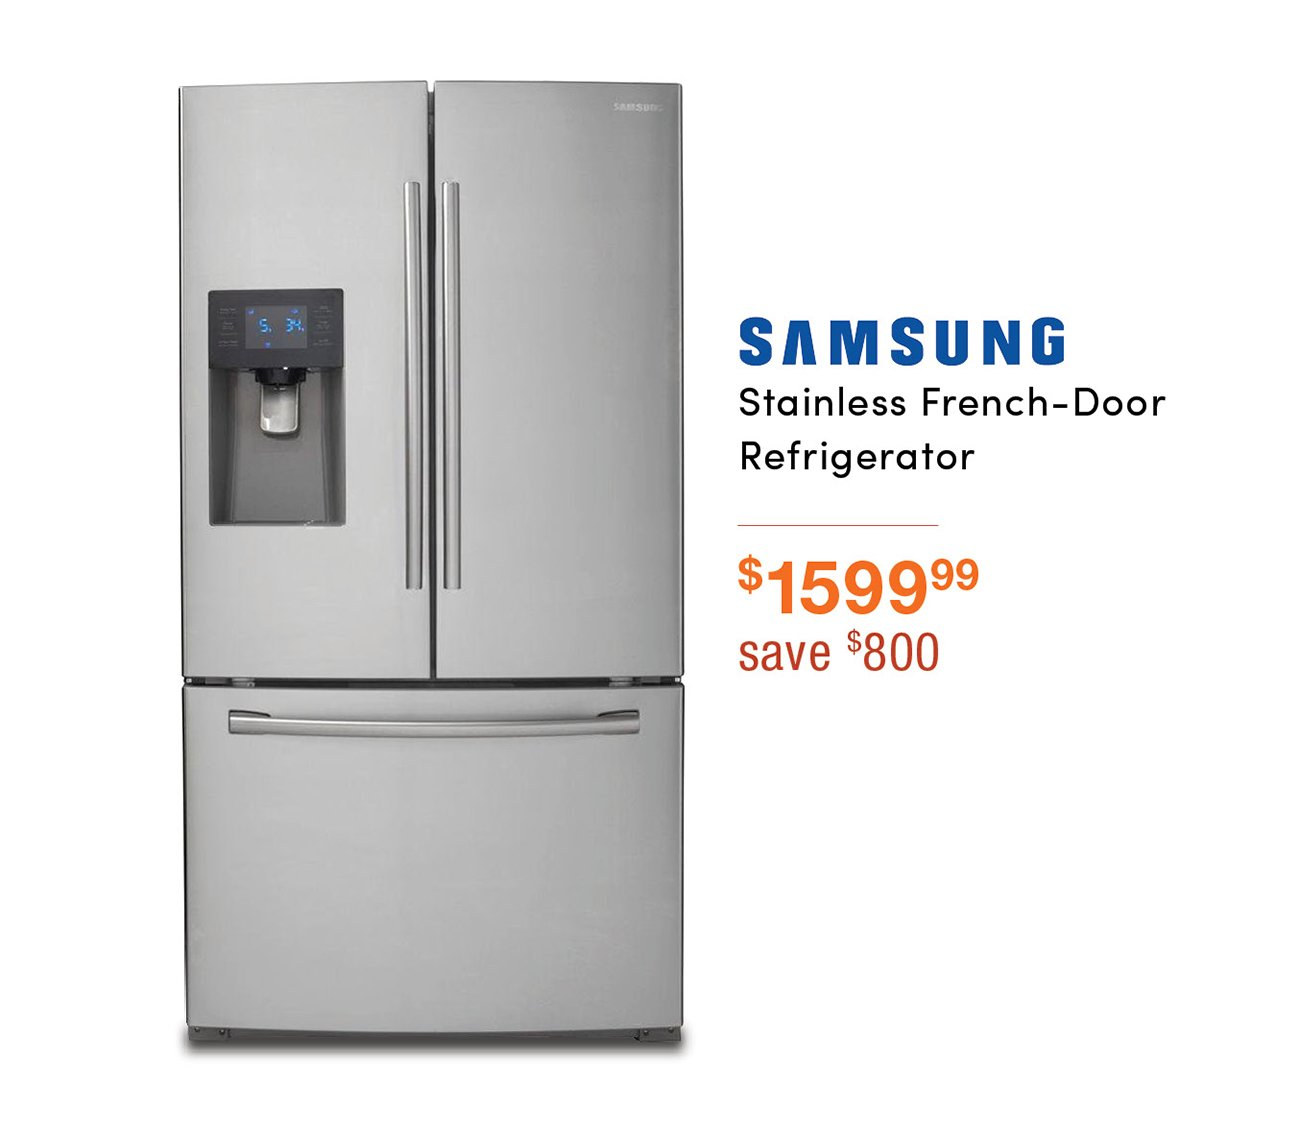 Samsung-french-door-refrigerator